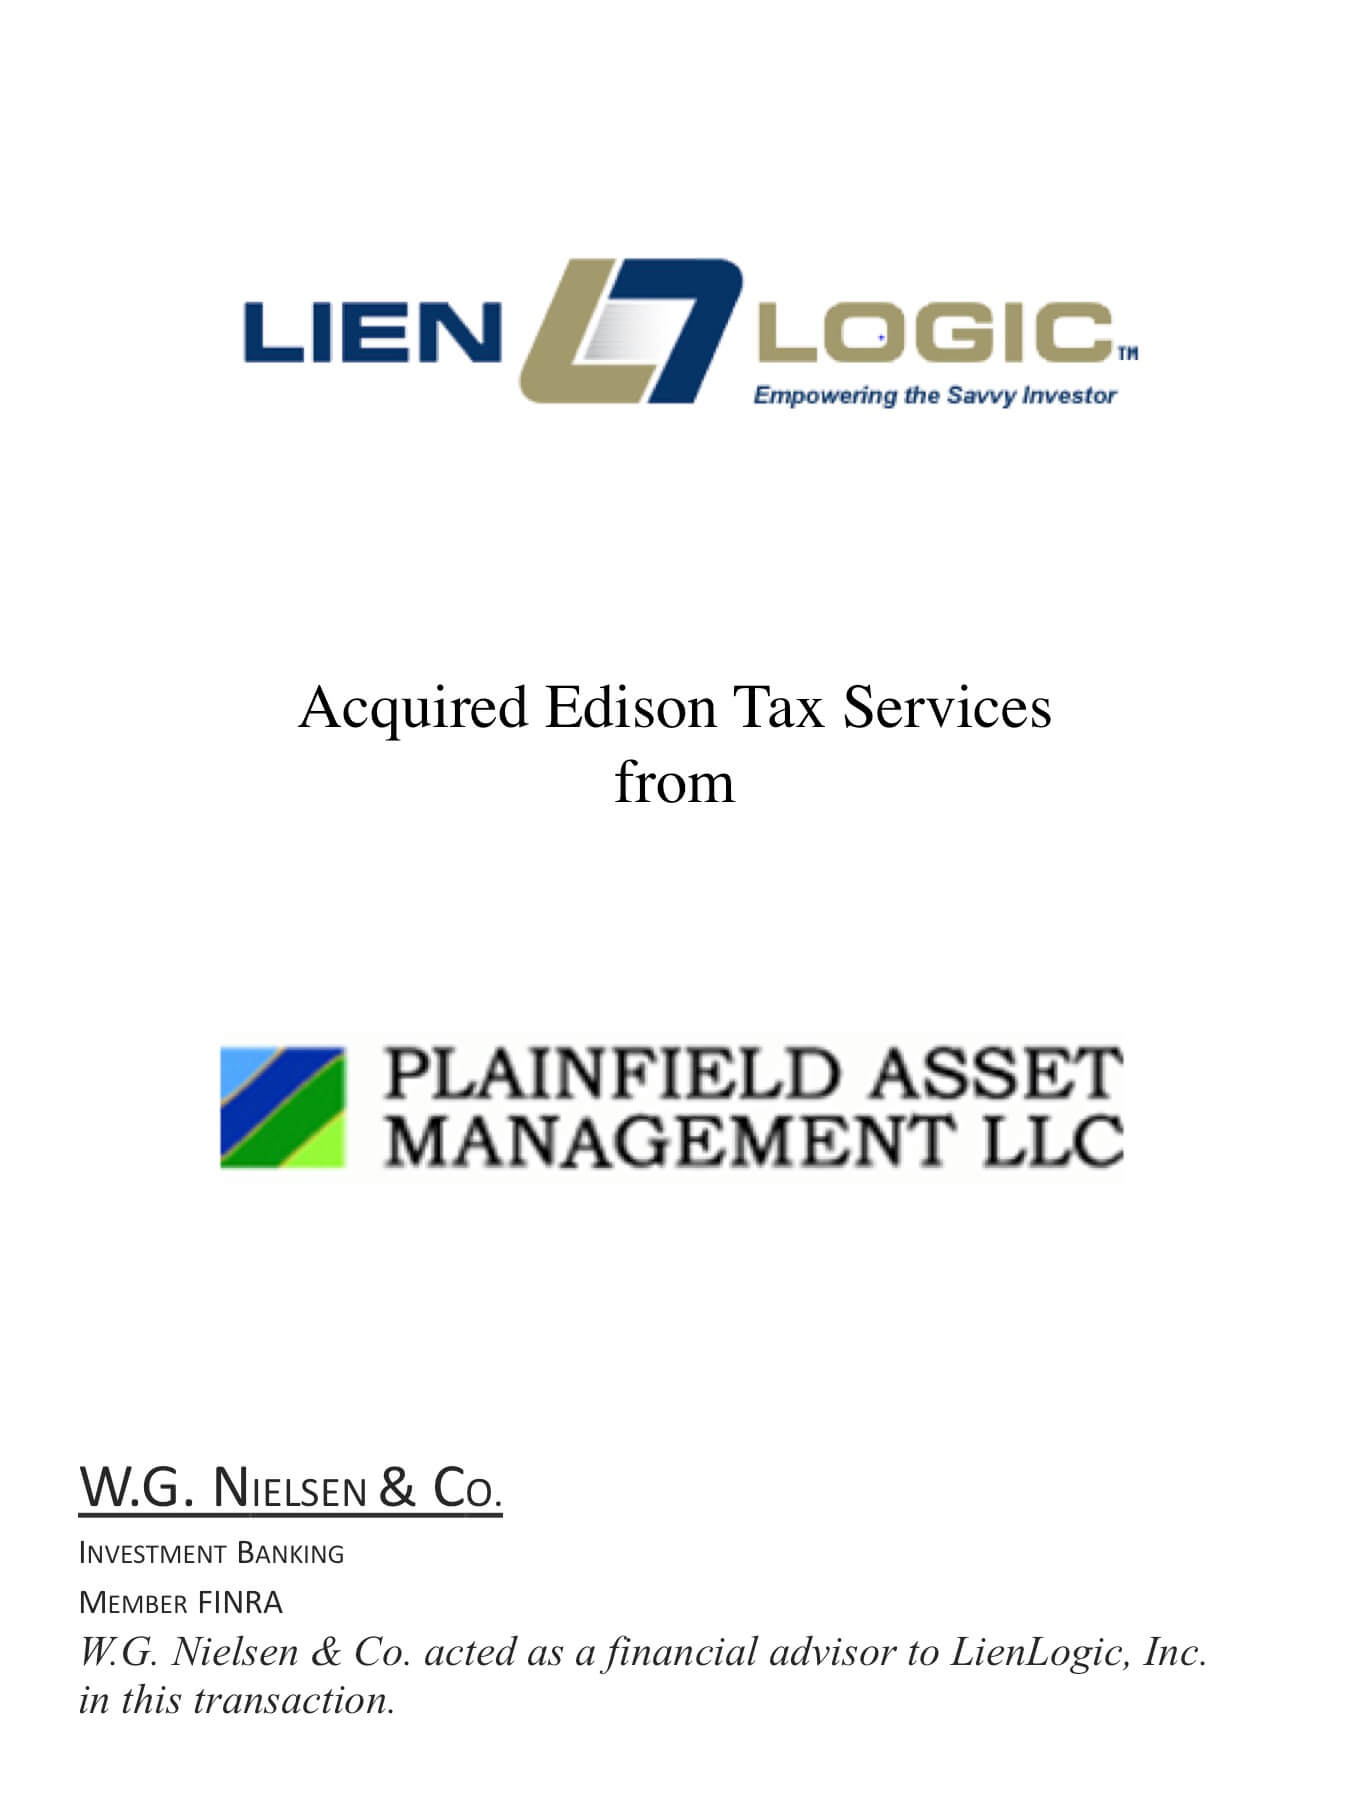 lien logic 2 investment banking transaction